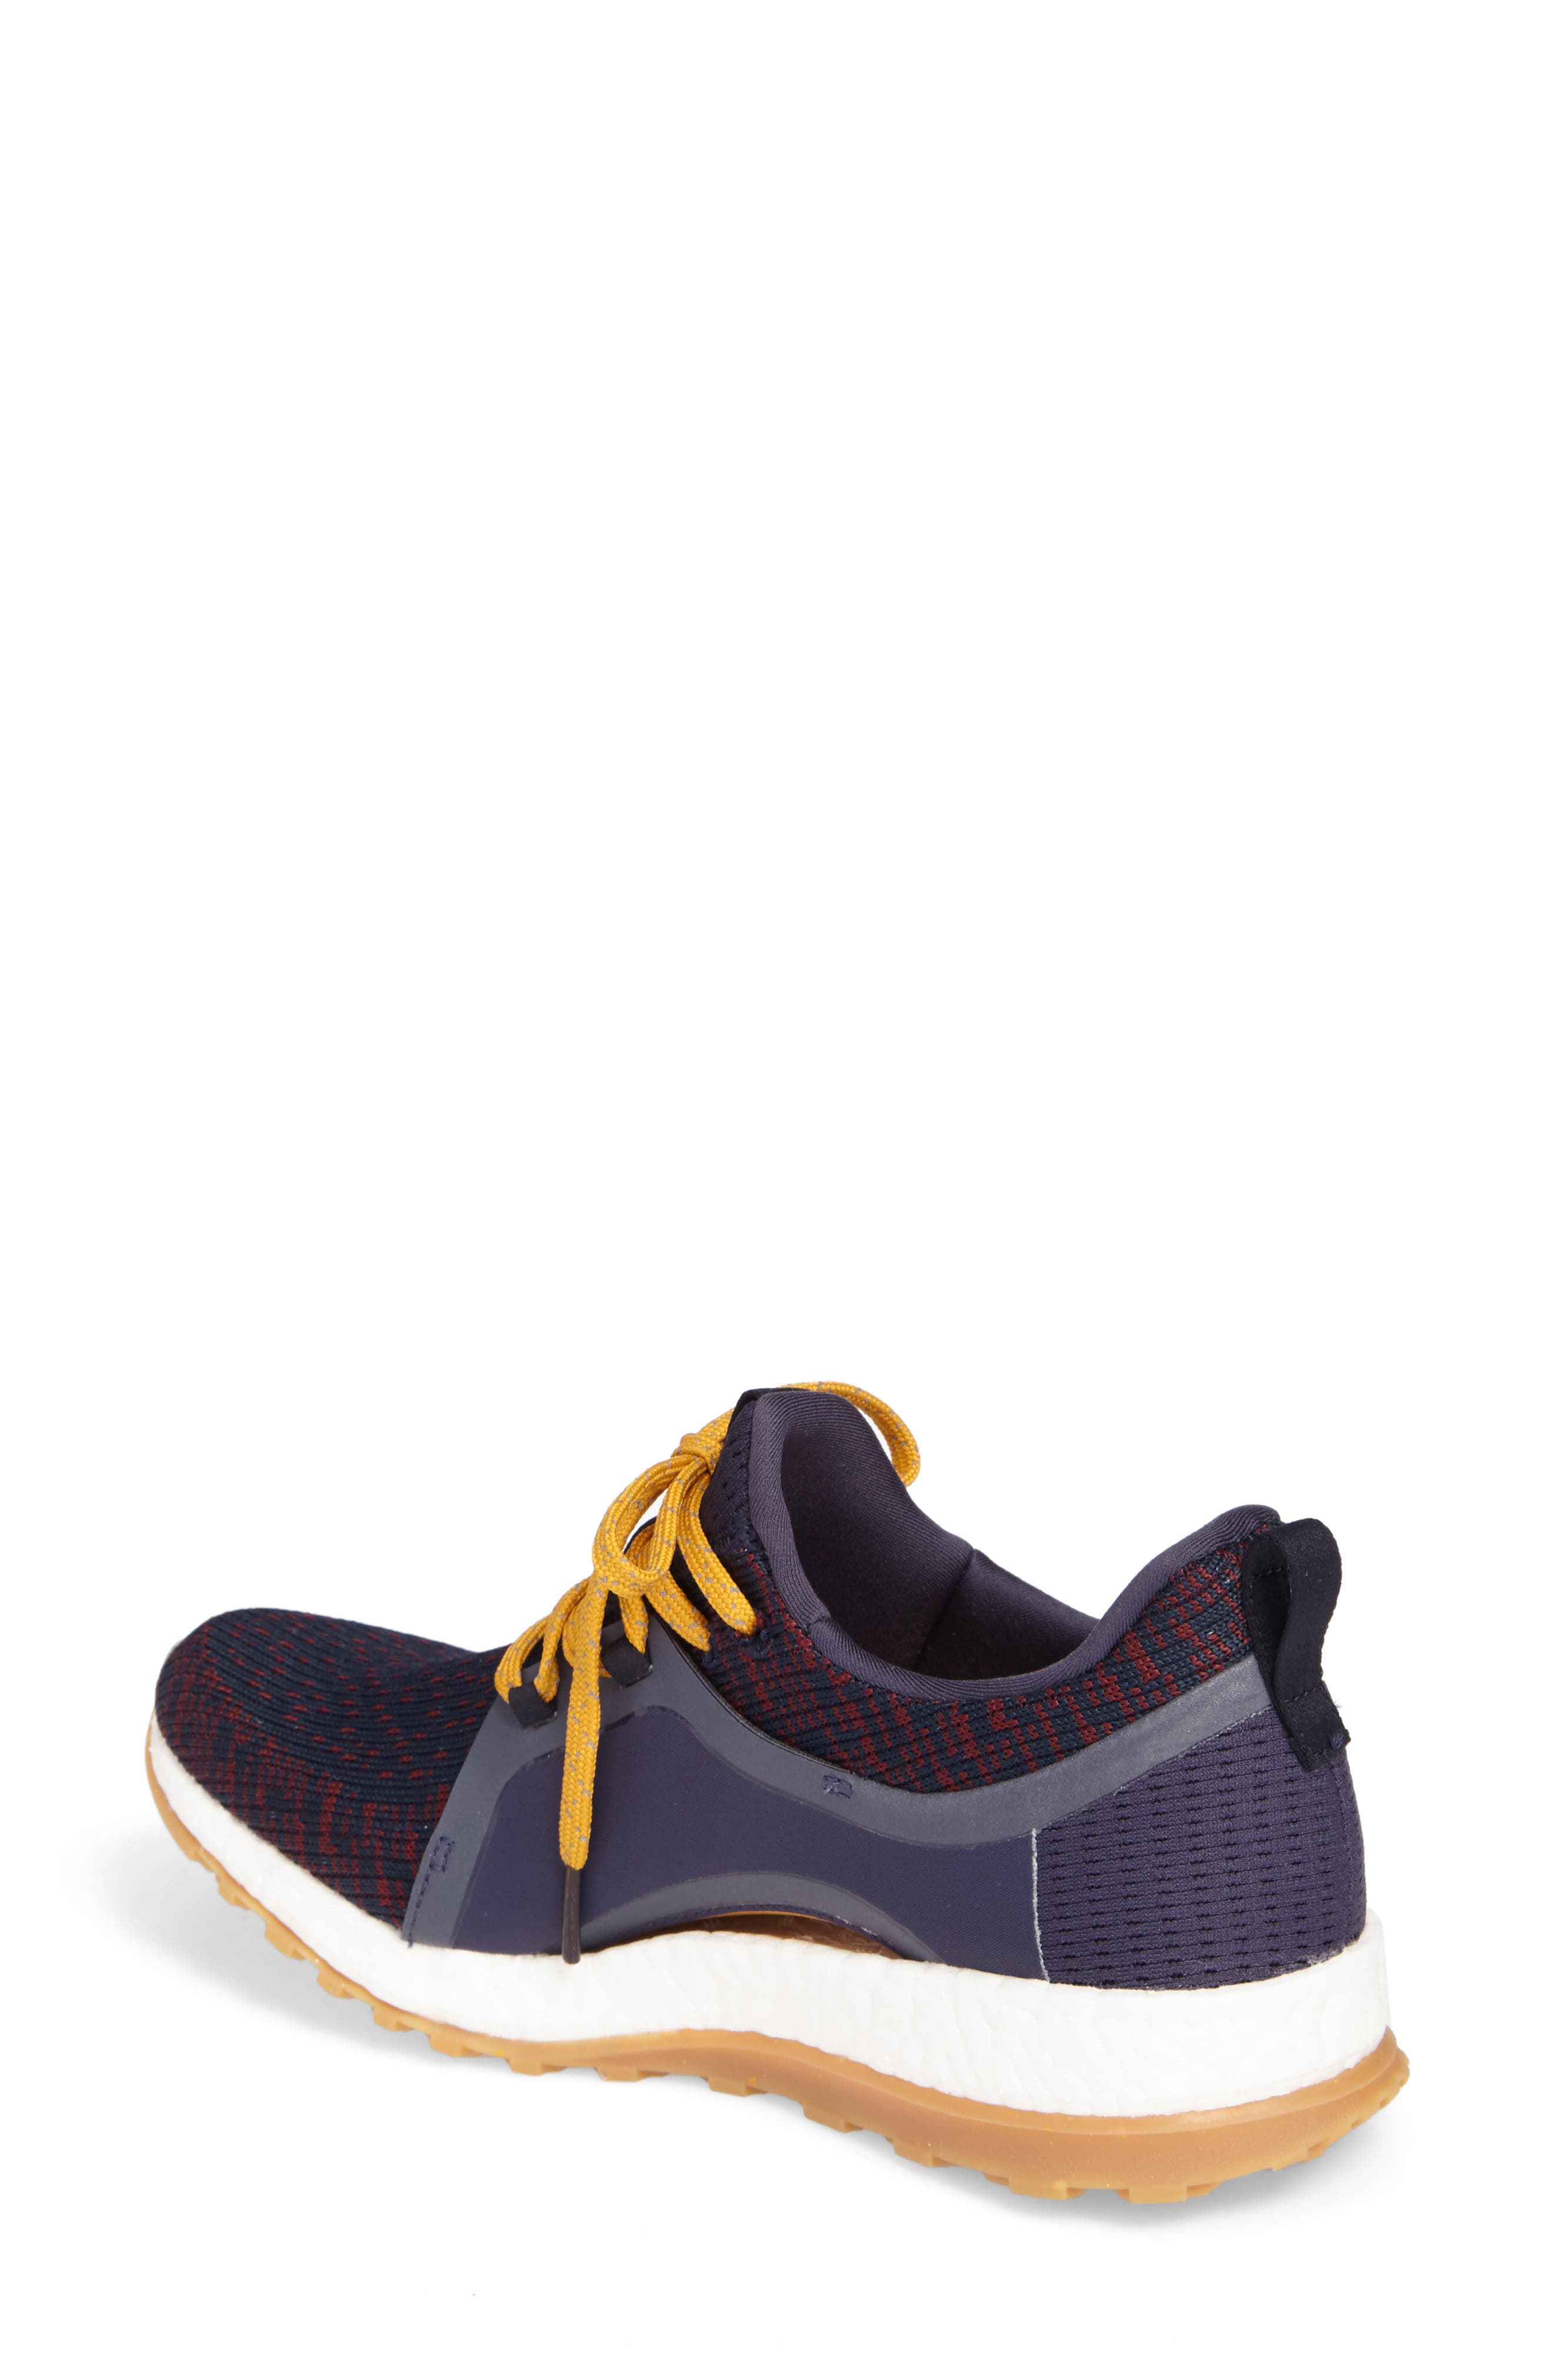 PureBoost X ATR Running Shoe,                             Alternate thumbnail 2, color,                             408